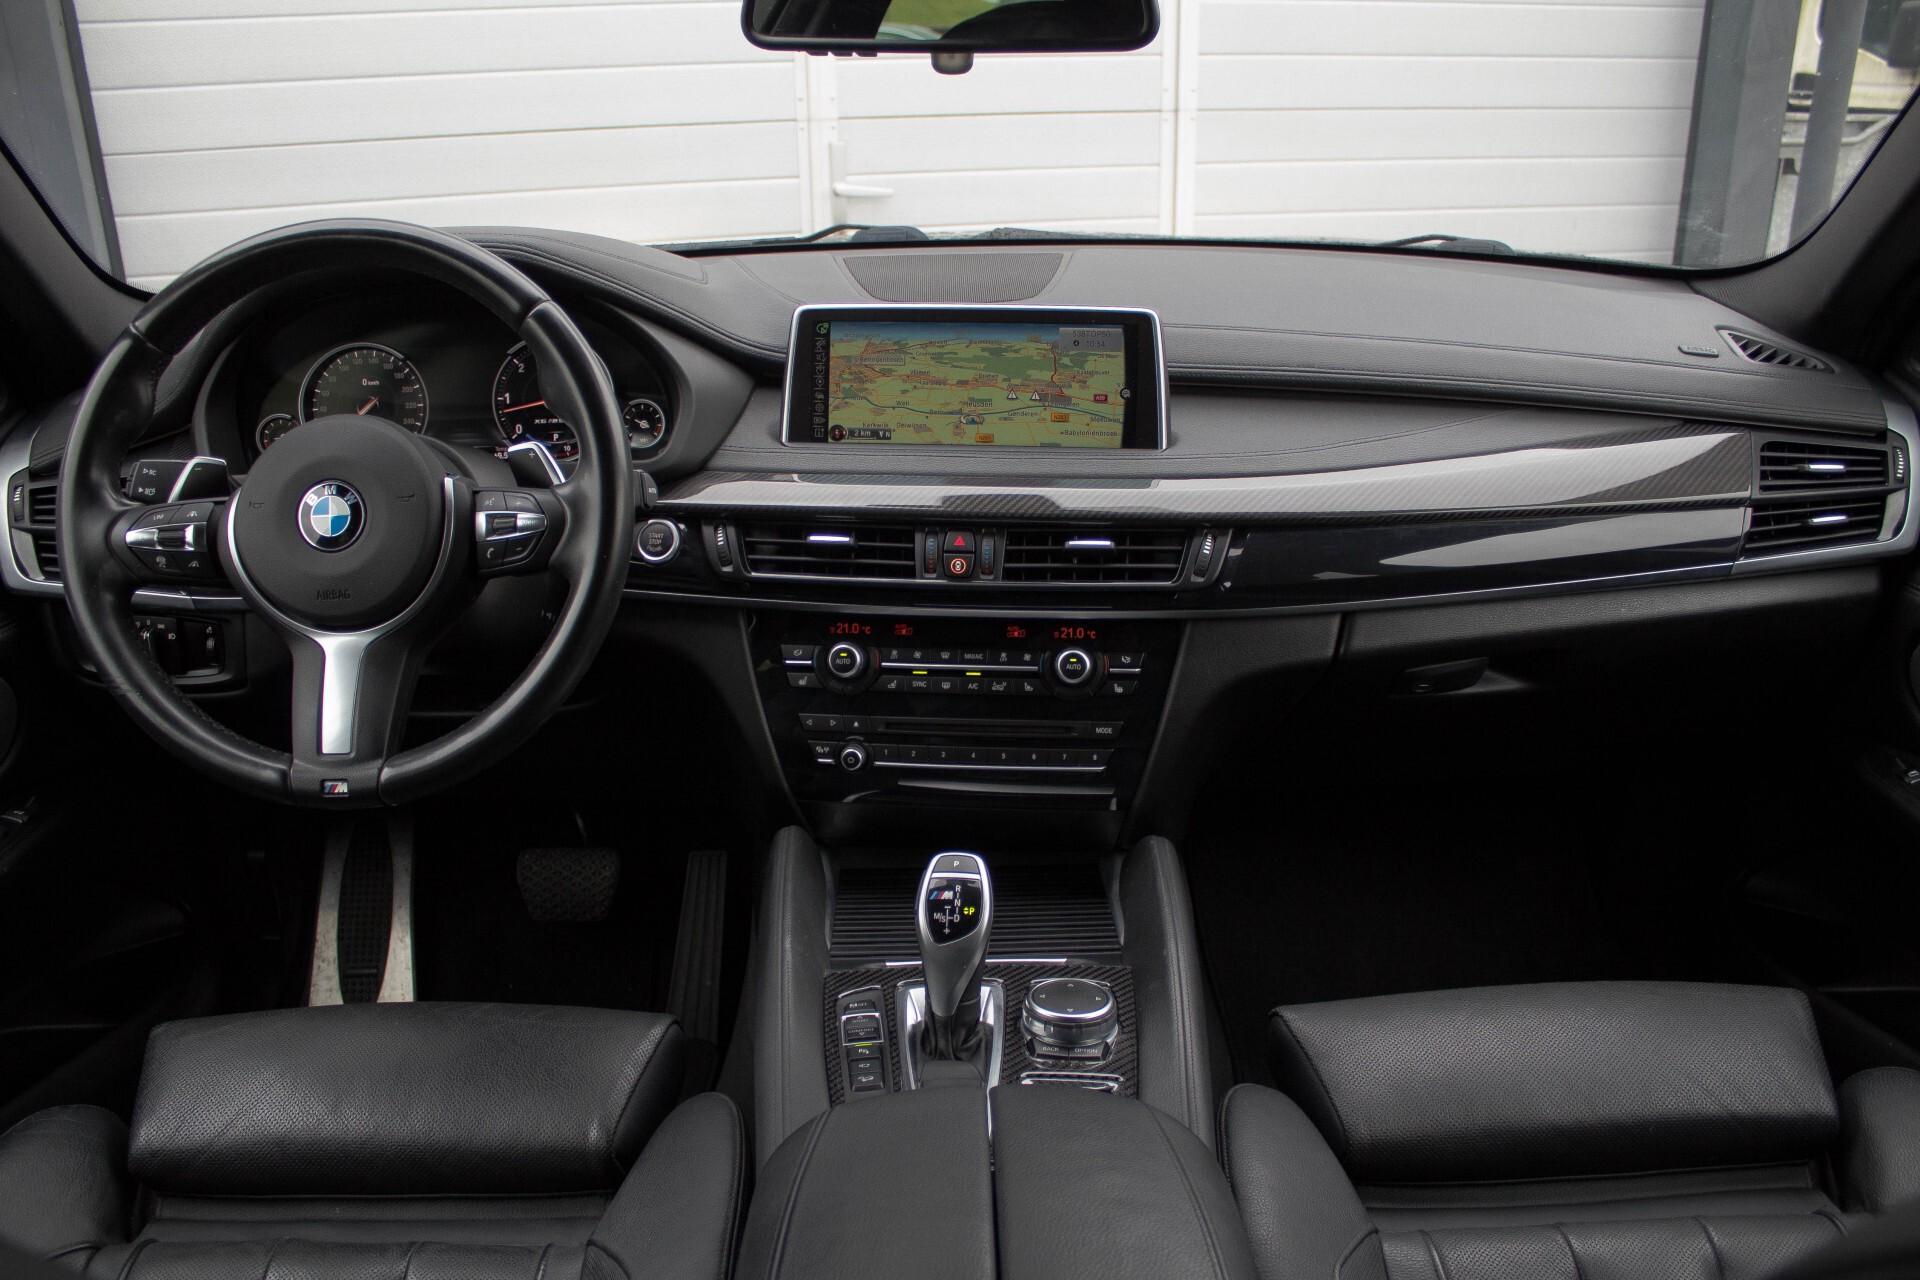 BMW X6 5.0d M Adaptive Drive/Comfortacces/Softclose/Adaptive Cruise/Standkachel/360camera/HUD/DAB Aut8 Foto 8